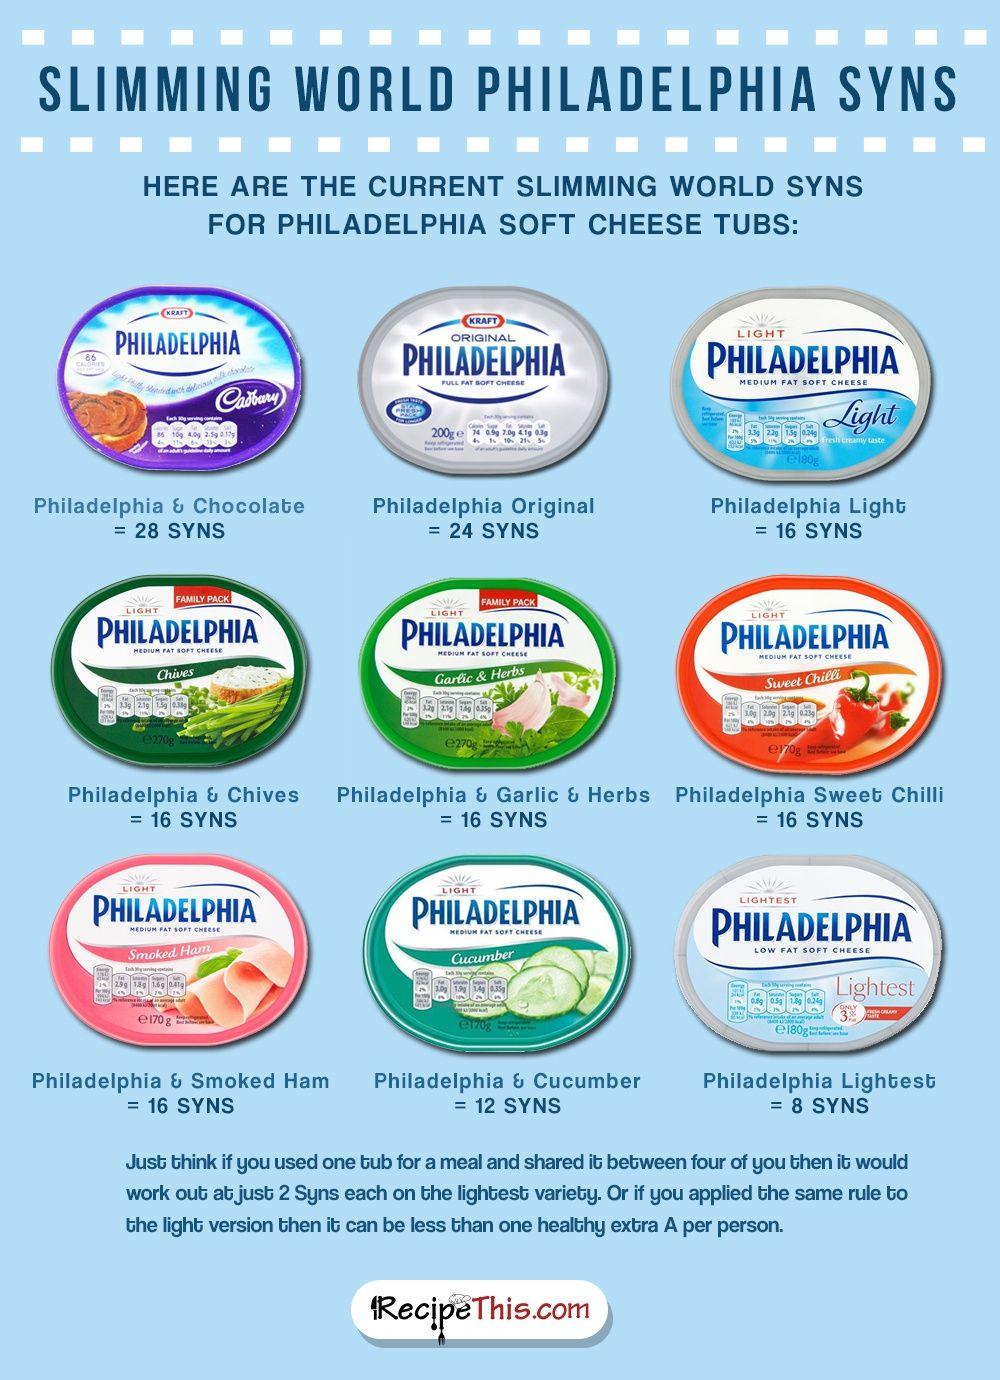 Slimming World Philadelphia Syns Slimming World Recipes